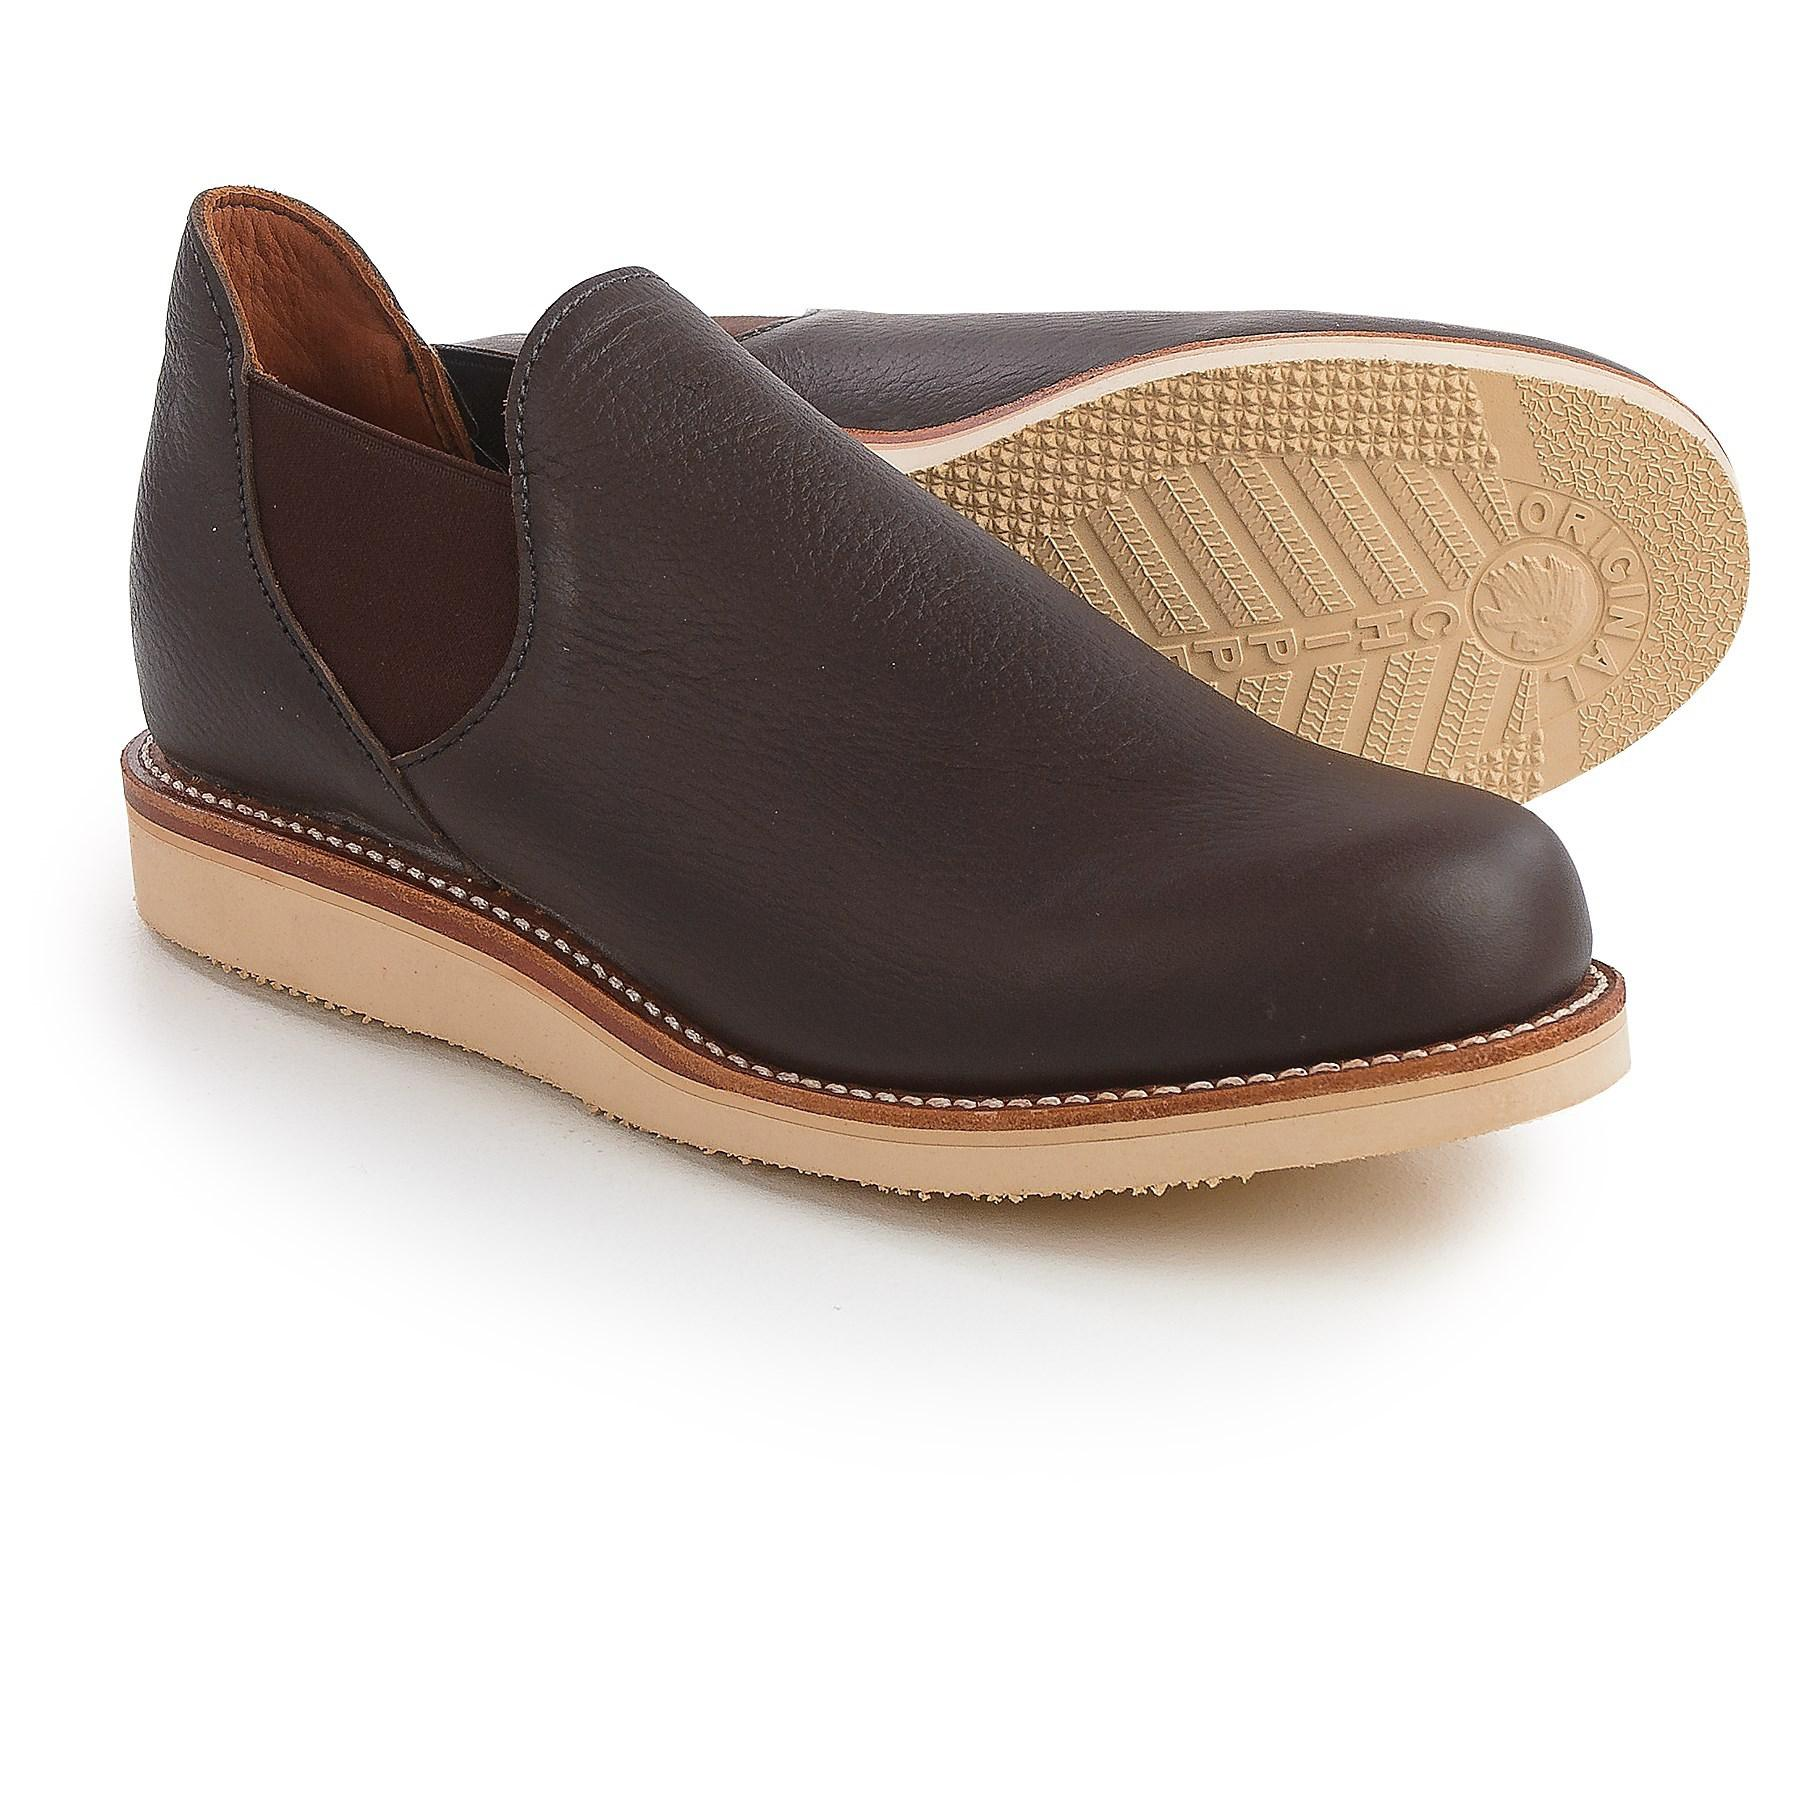 f0112971781 Lyst - Chippewa 1967 Original Romeo Shoes for Men